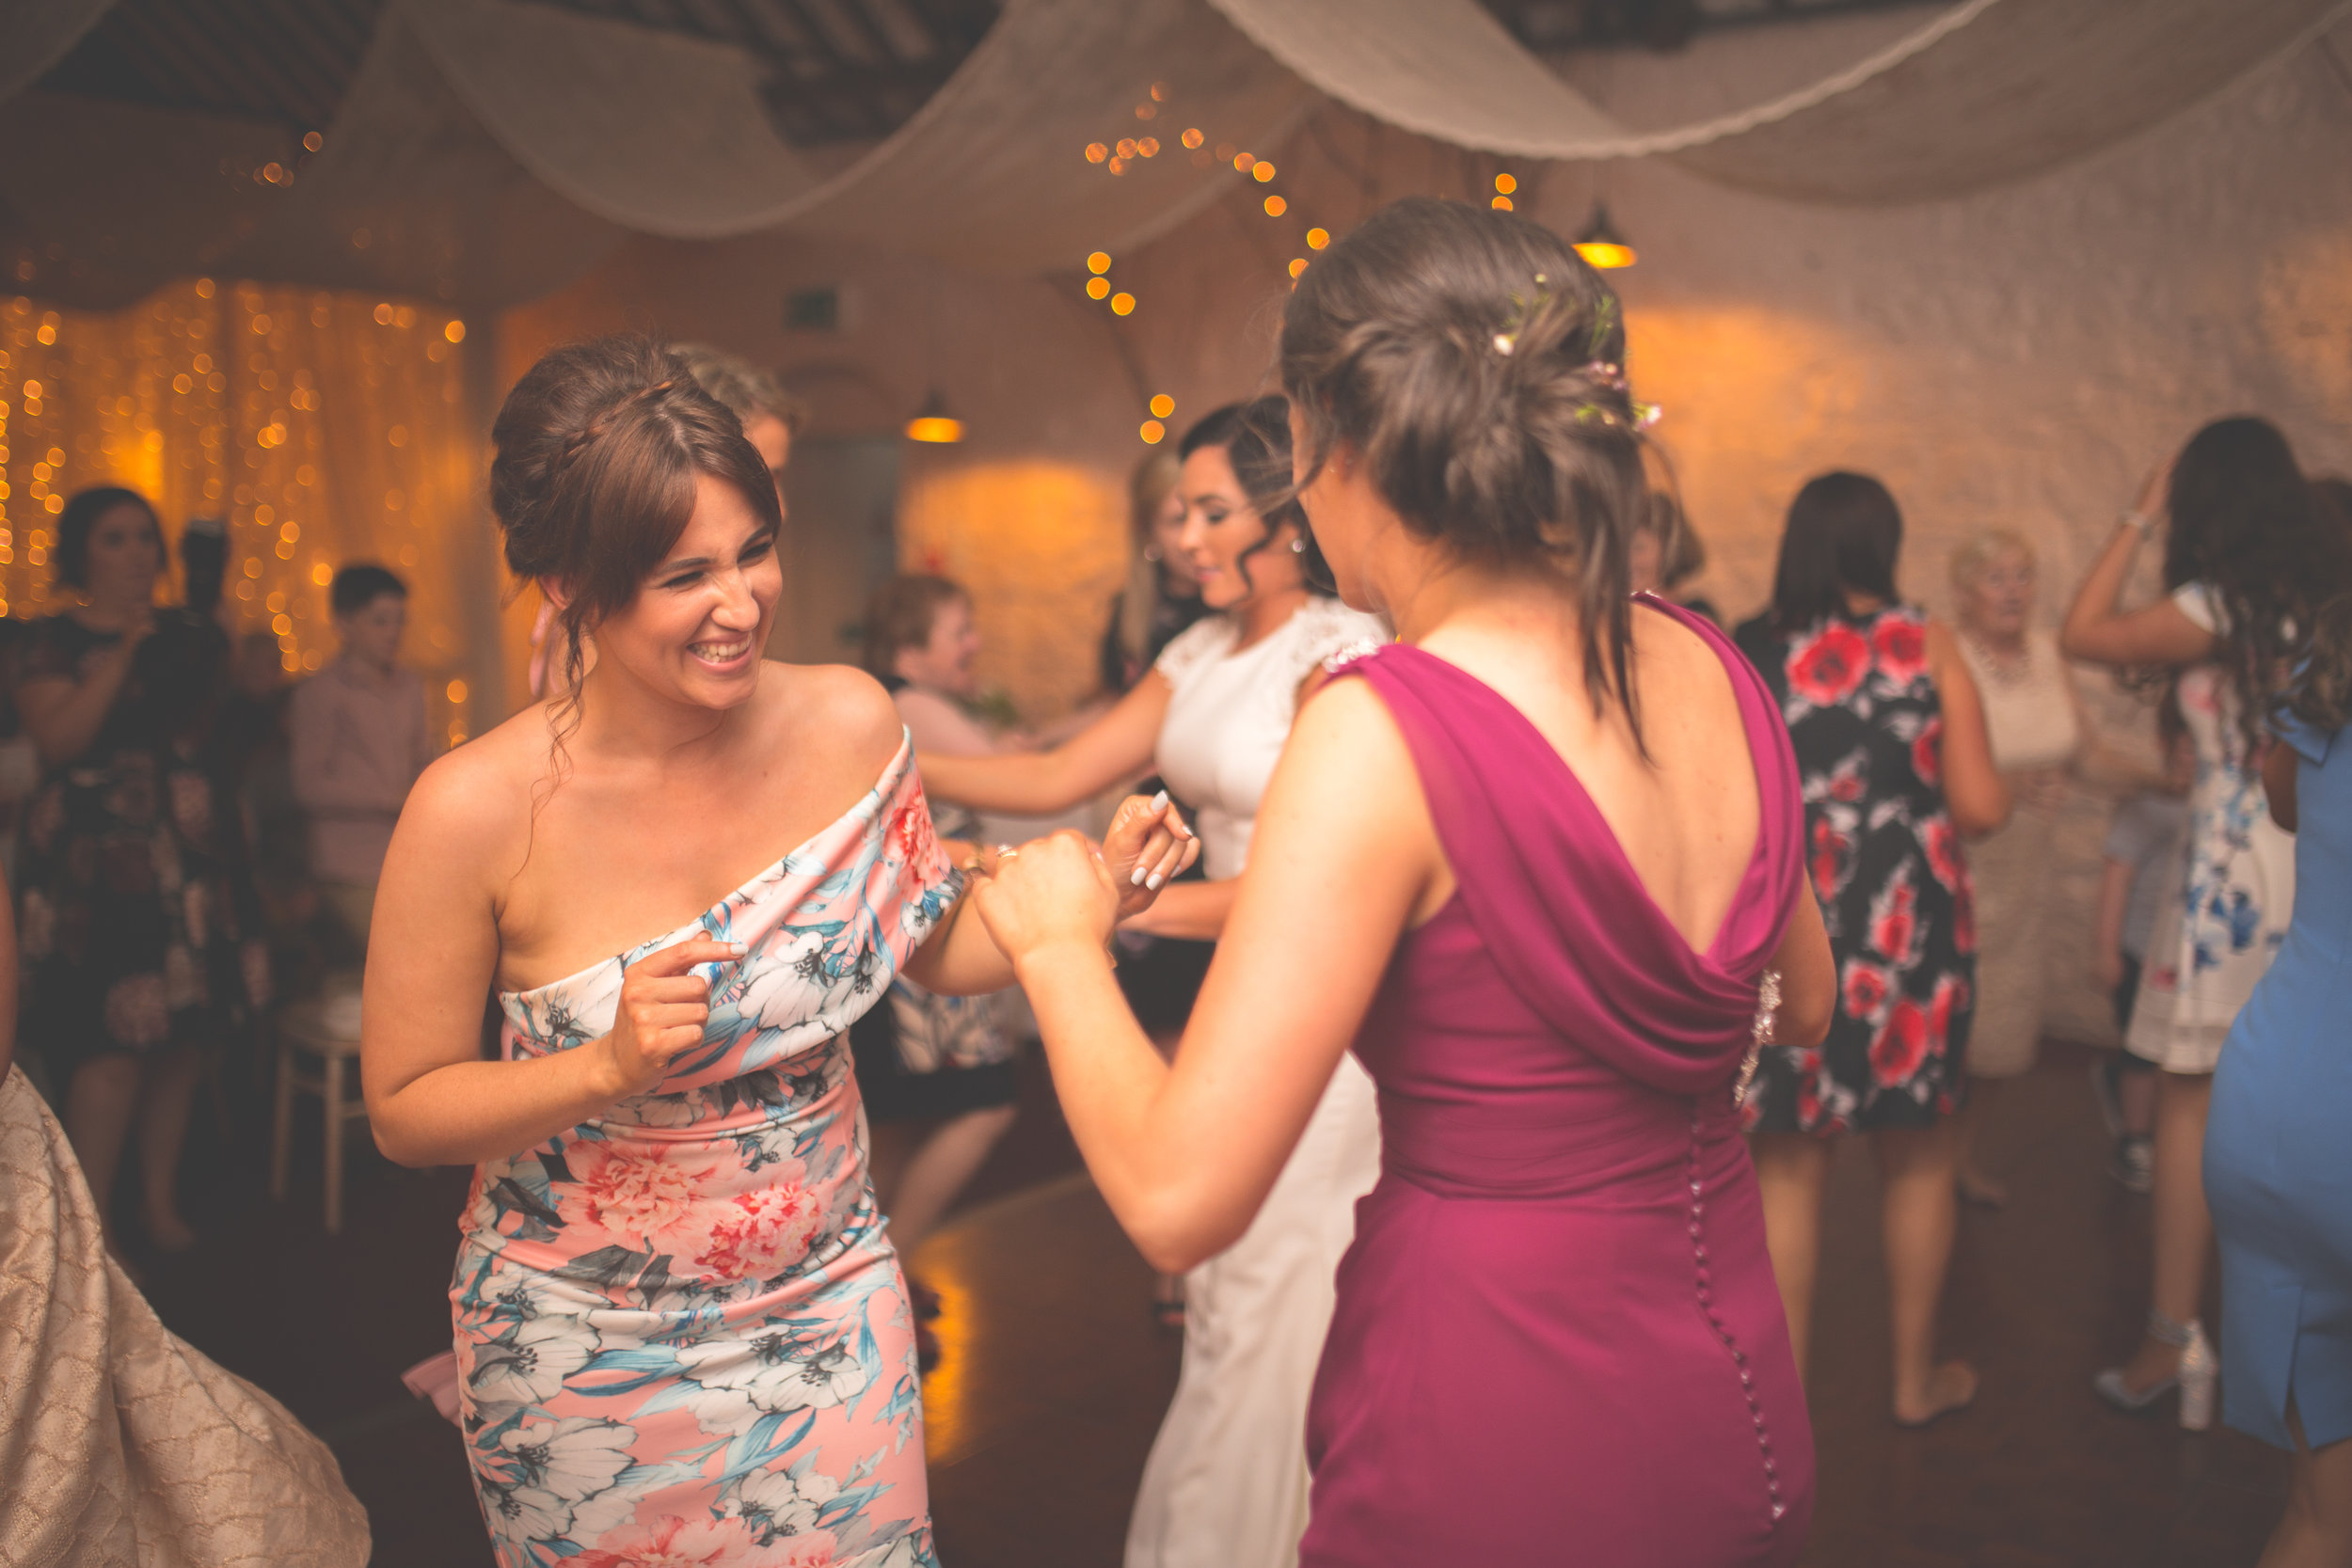 Brian McEwan Wedding Photography | Carol-Annee & Sean | The Dancing-87.jpg